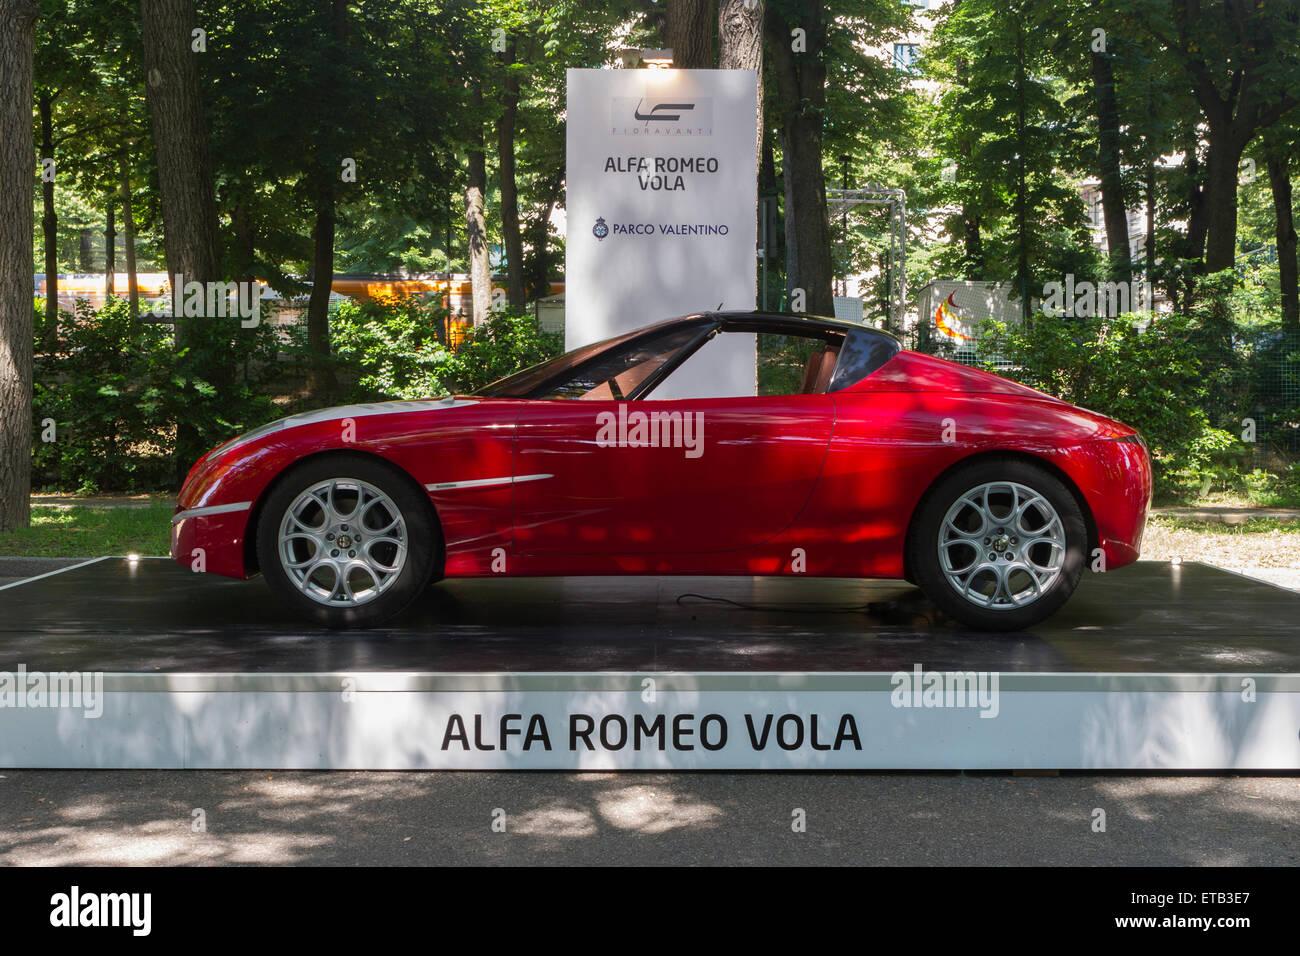 Turin, Italy, 11th June 2015. Prototype car Alfa Romeo Vola by Fioravanti. Parco Valentino car show hosted 93 cars - Stock Image